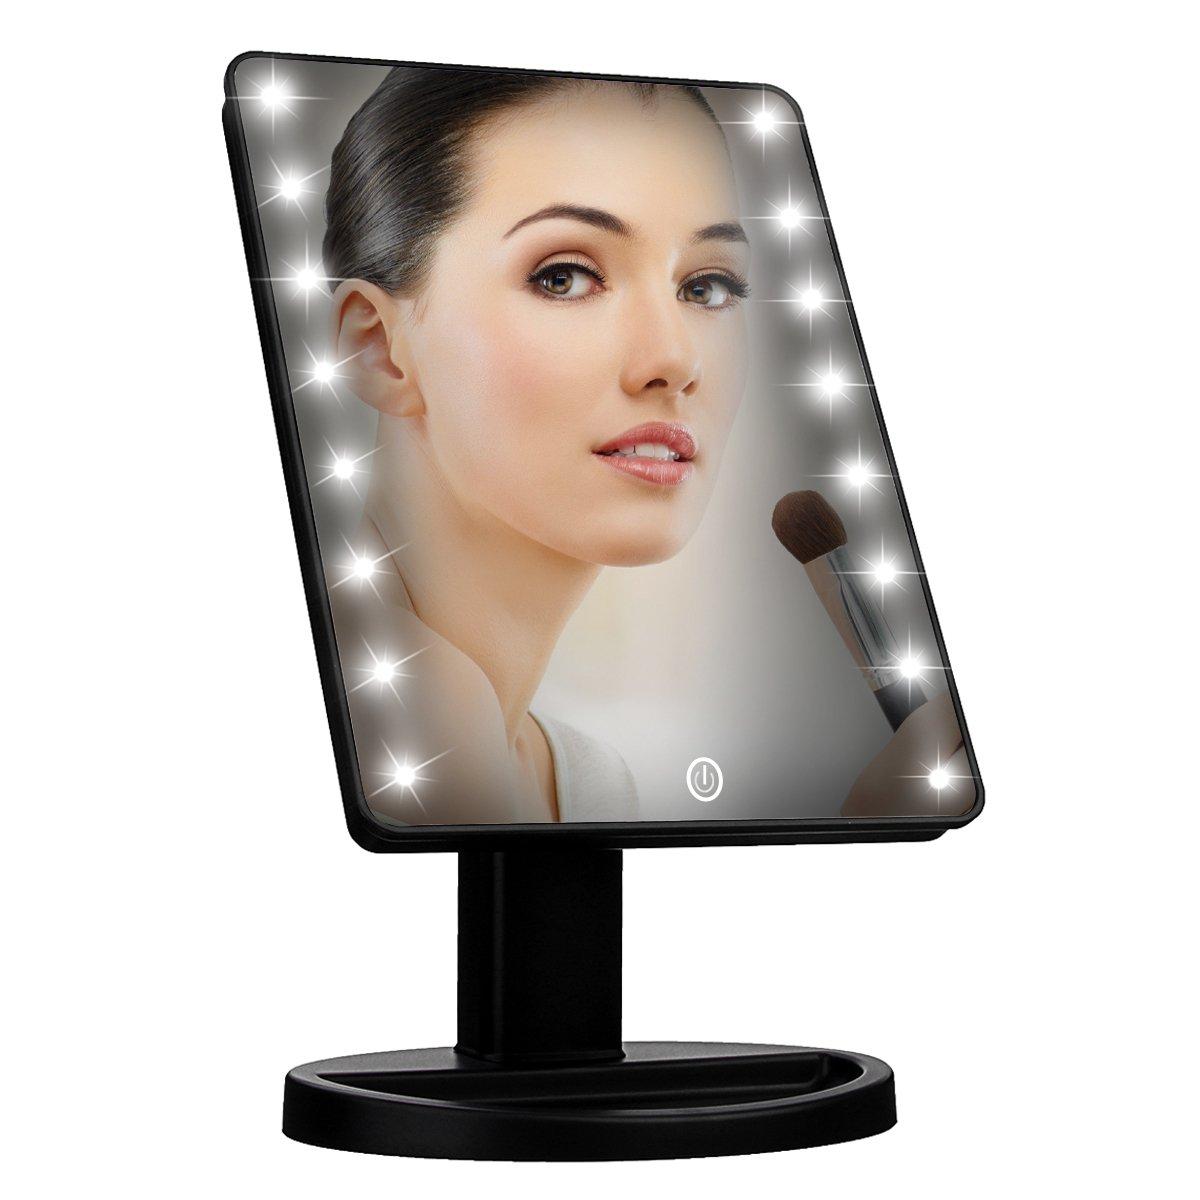 (Black) - Makeup Light Mirror, Charminer 16 LEDs Touch Light Illuminated Cosmetic Desktop Vanity Mirror with Stand,Handy Touching On/Off Black B01LZI8Q6T ブラック ブラック